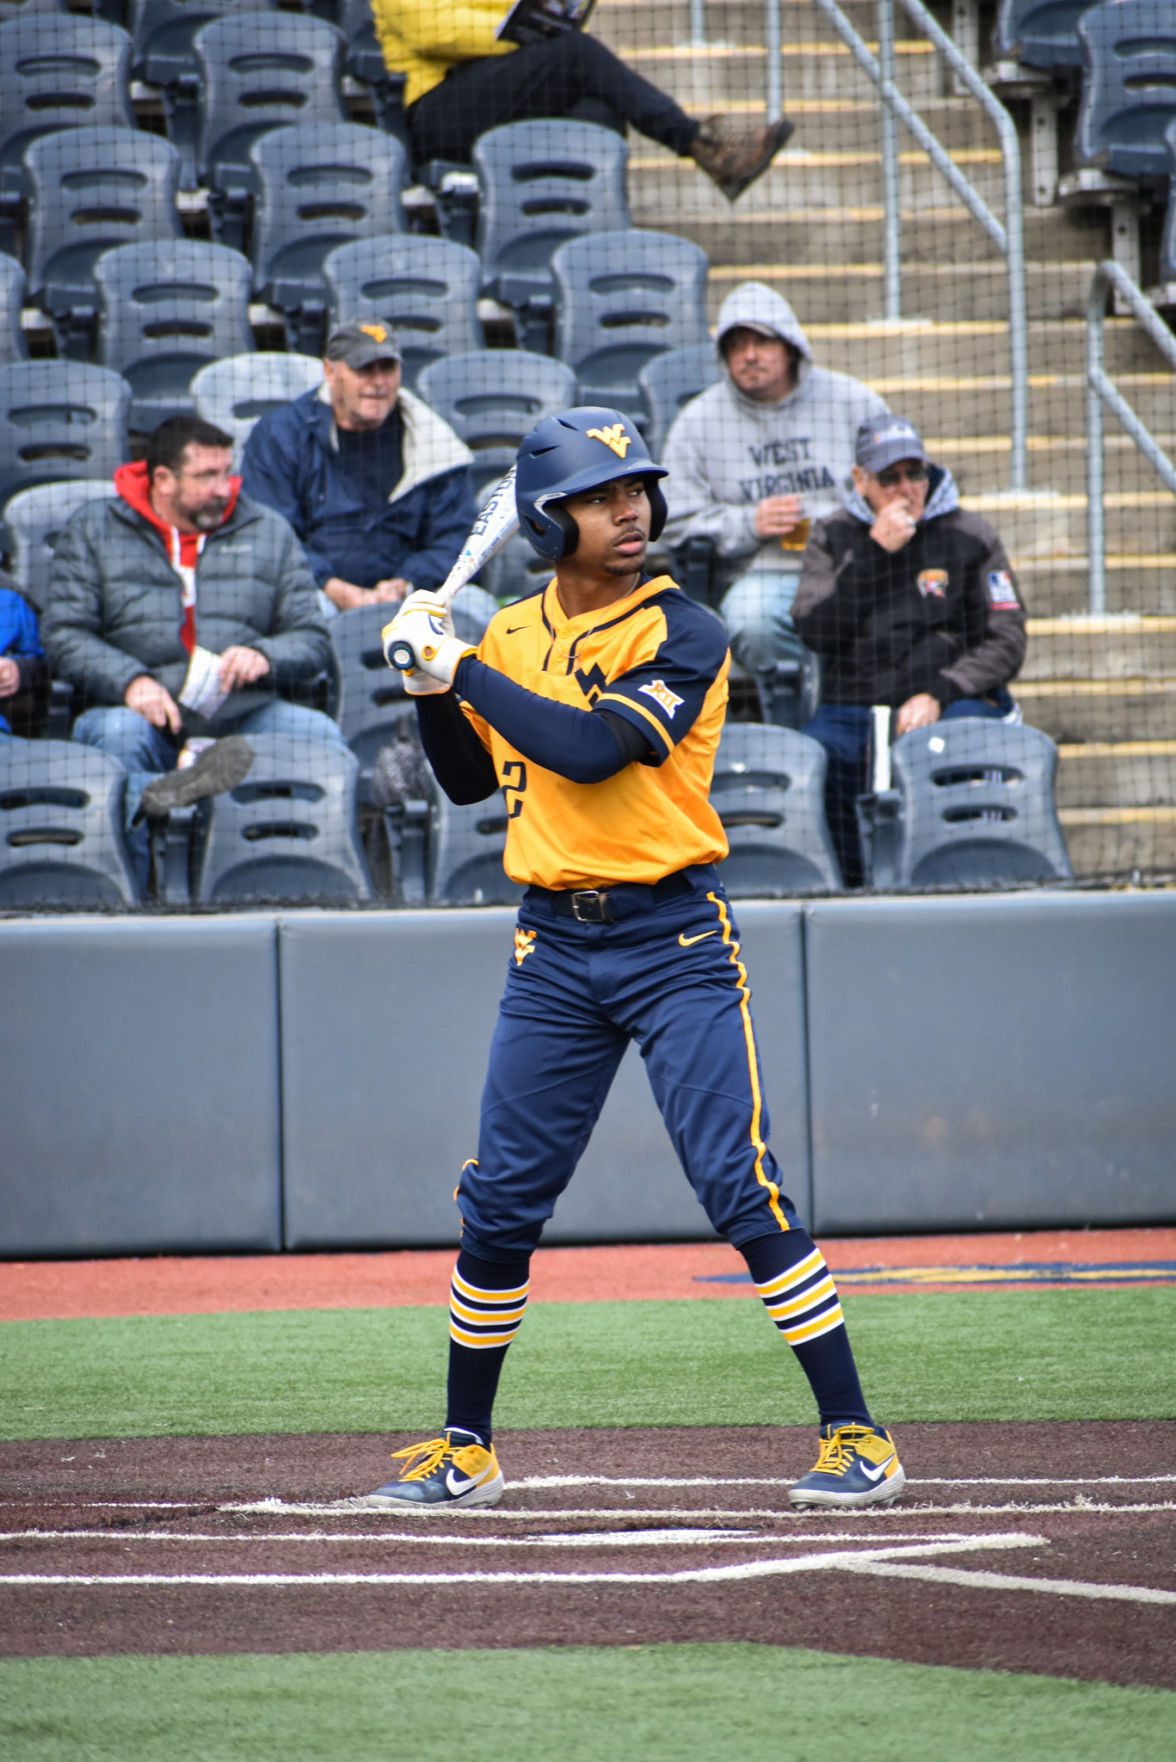 Mar. 11, 2020 - Sophomore Tevin Tucker prepares for his at bat against Liberty at Monongalia County Ballpark